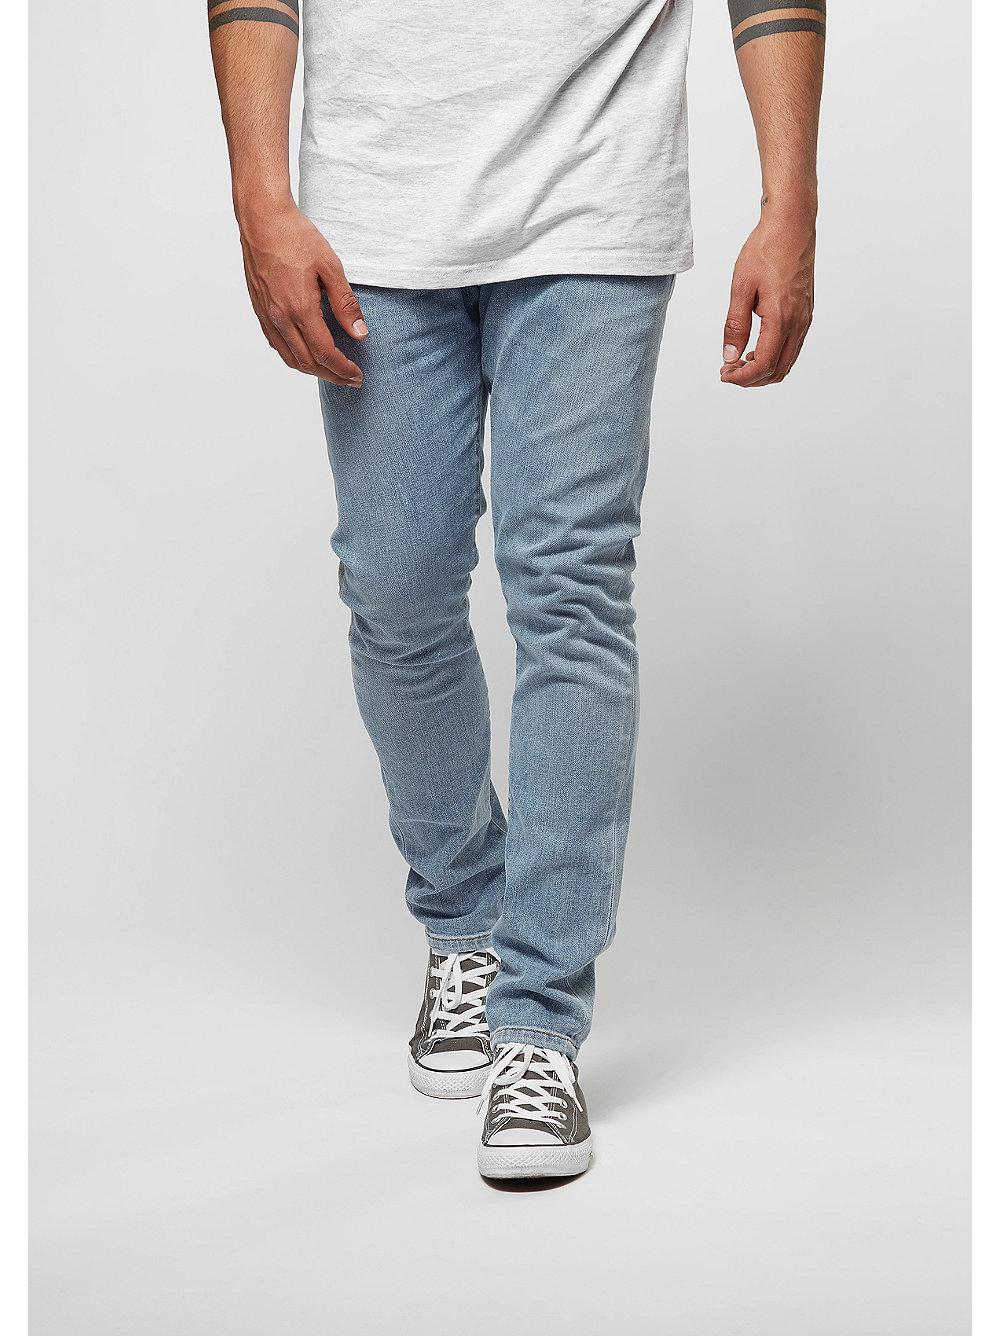 Jeans-Hose Rebel blue true bleached